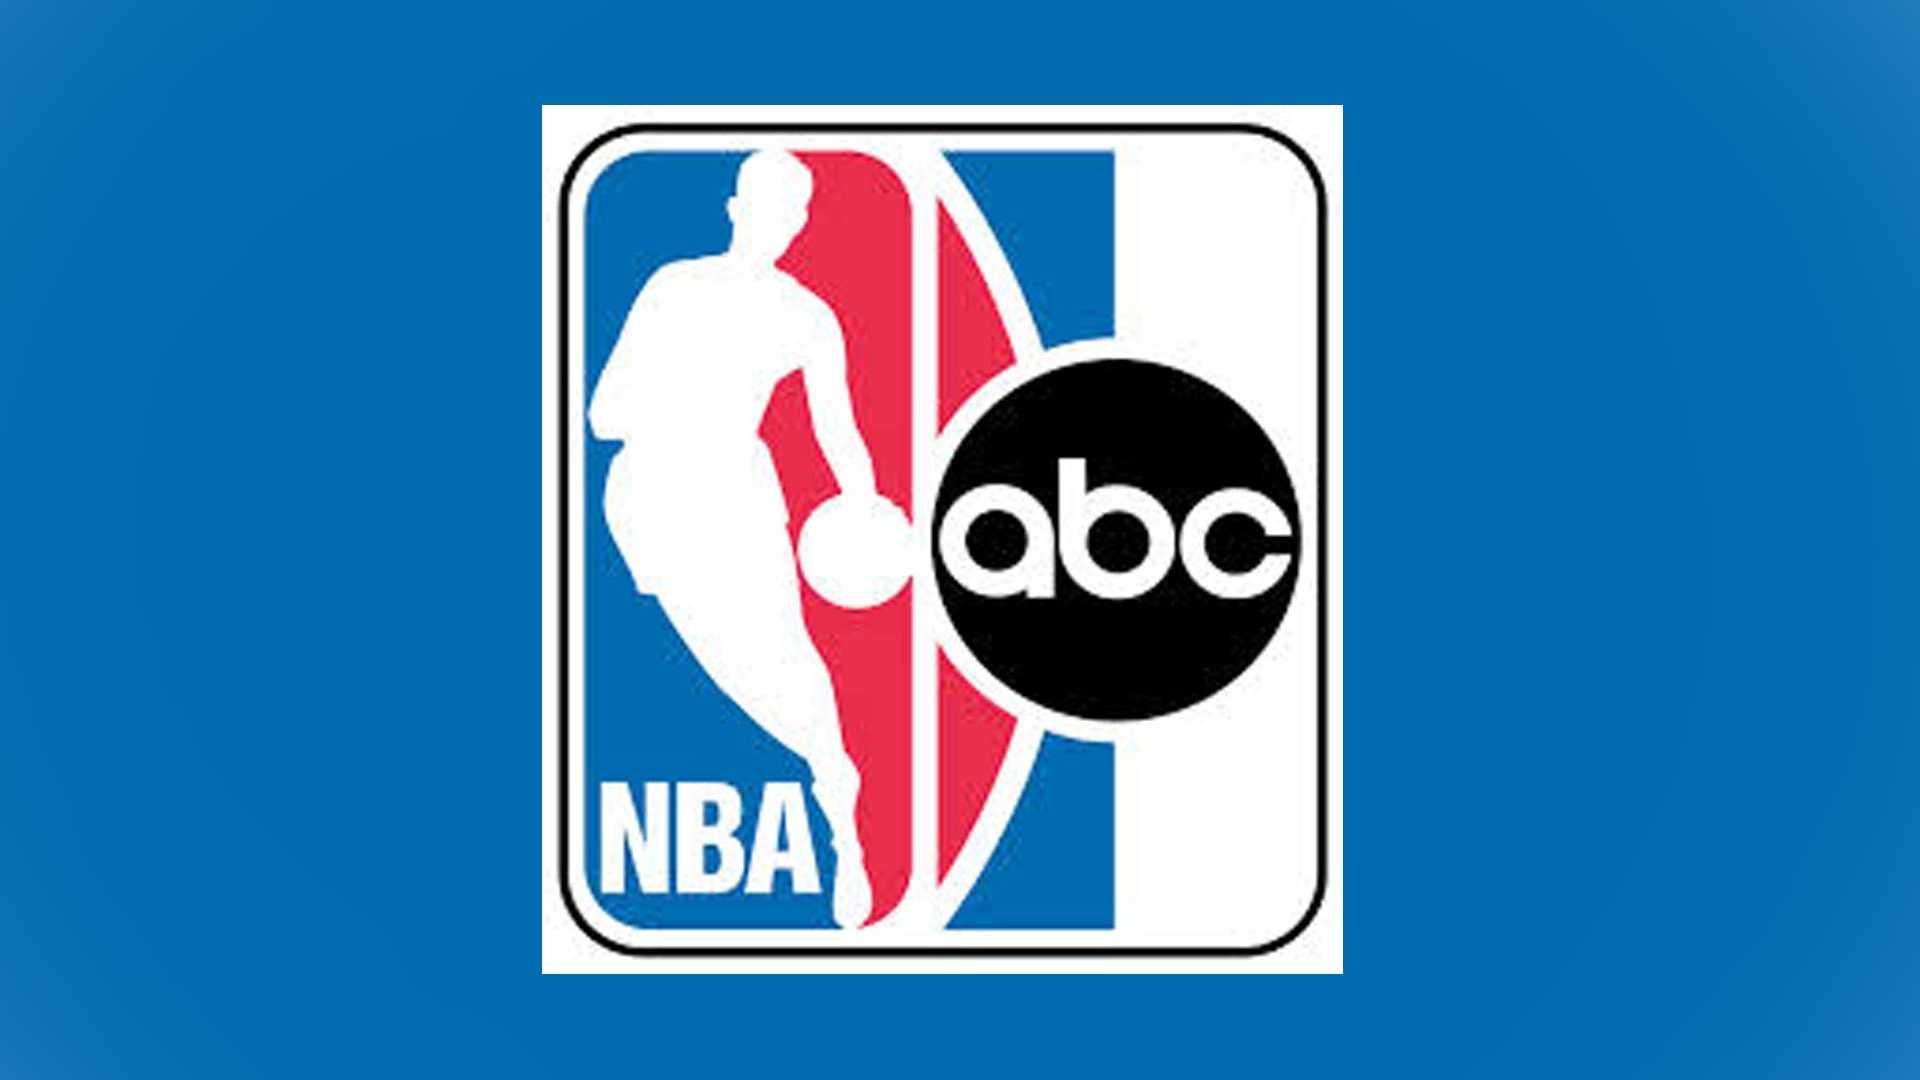 Wednesday, December 25: NBA Basketball